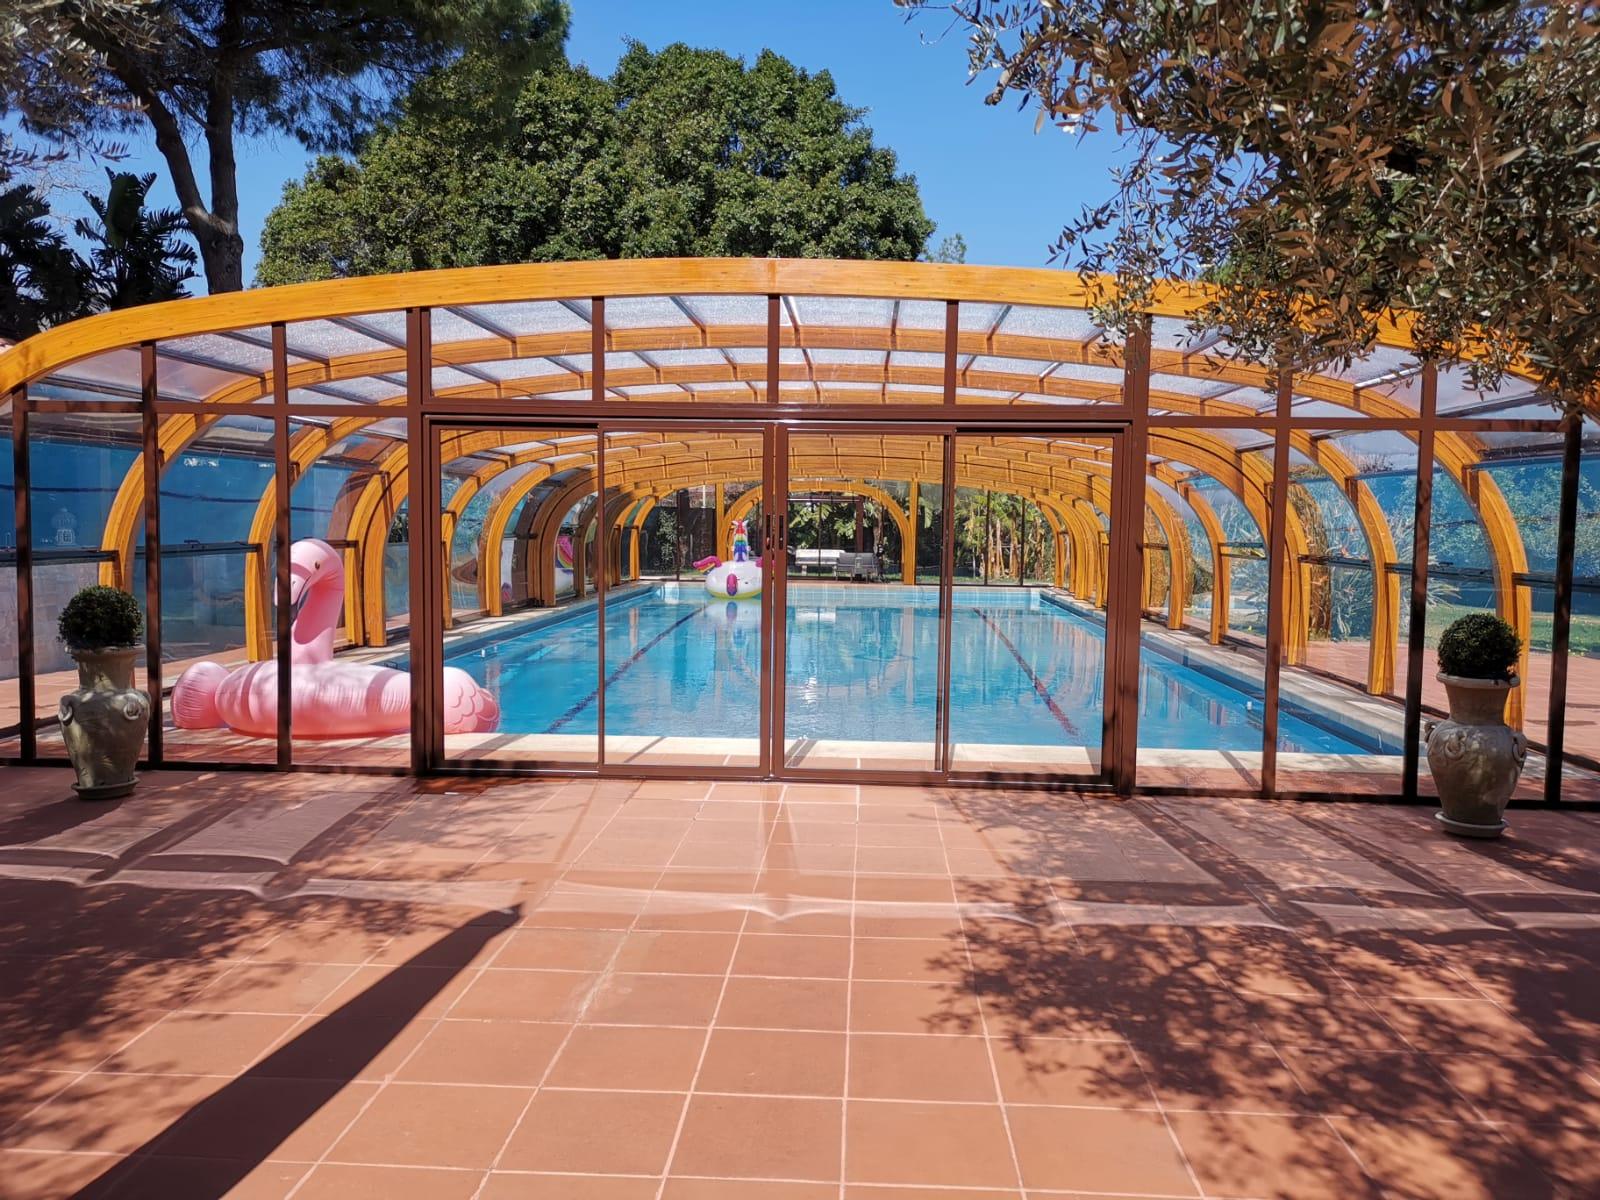 Copertura piscina alta legno